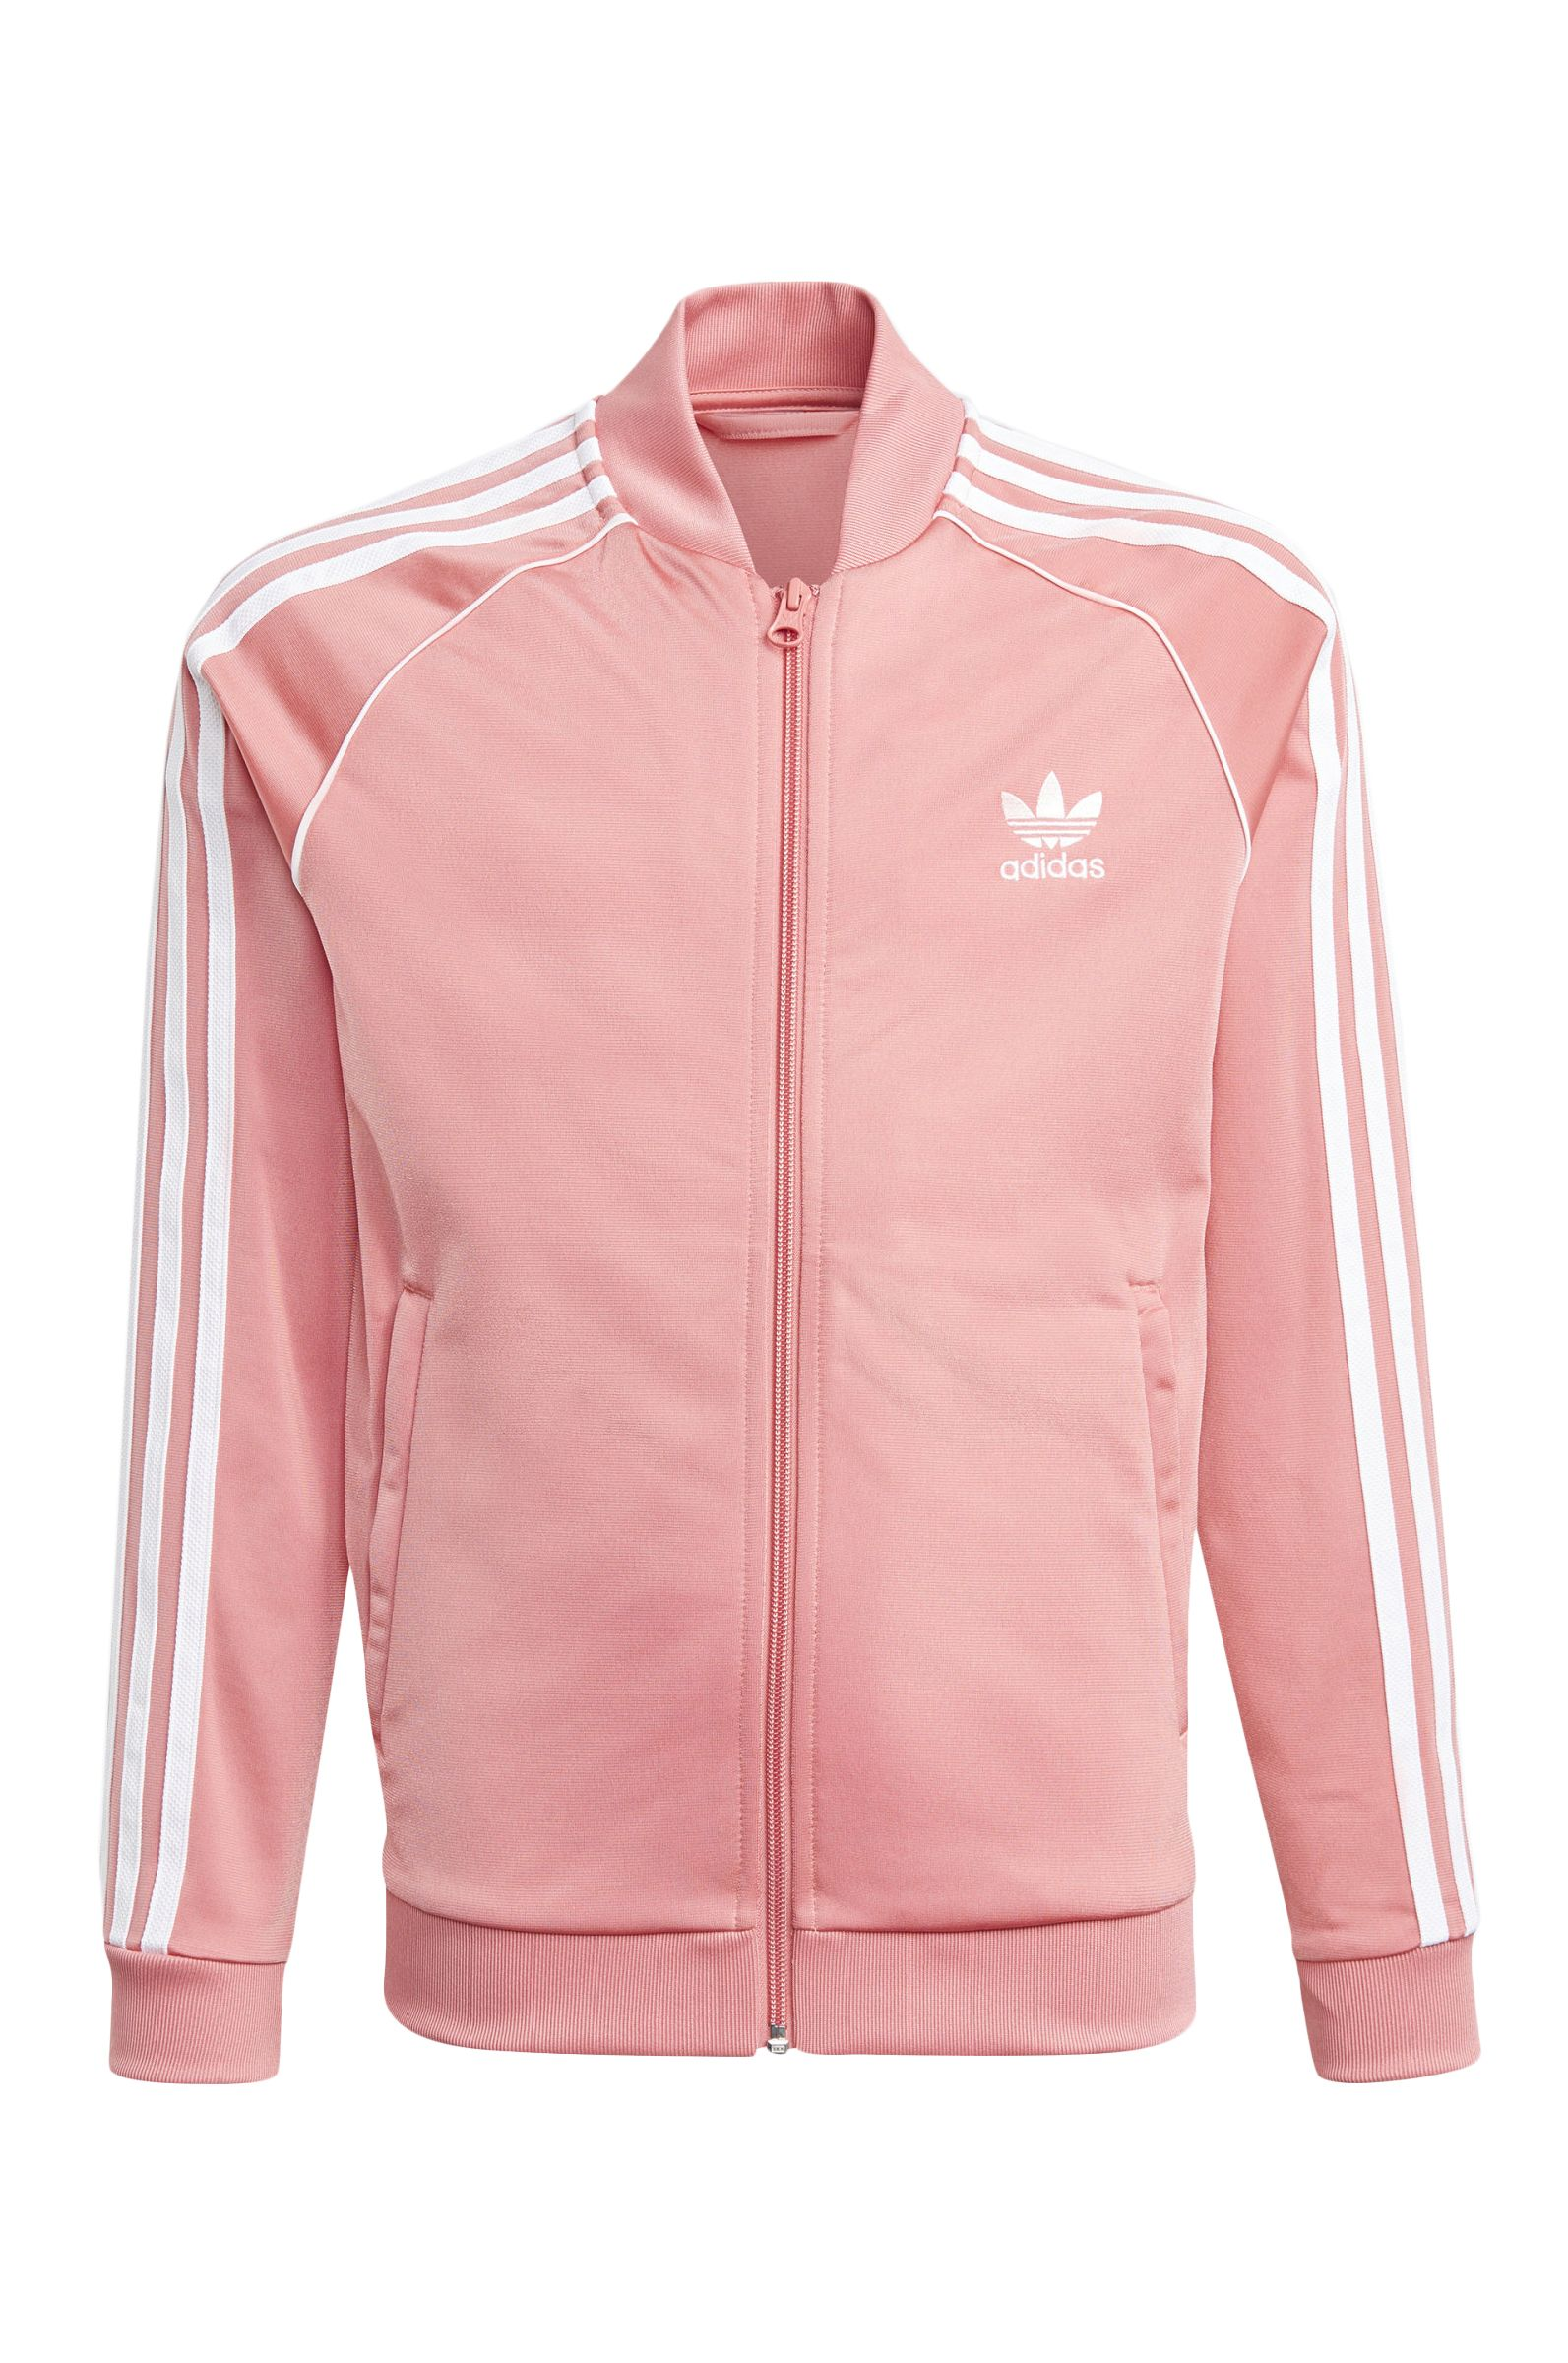 Sweat Fecho Adidas SST TRACKTOP Hazy Rose/White